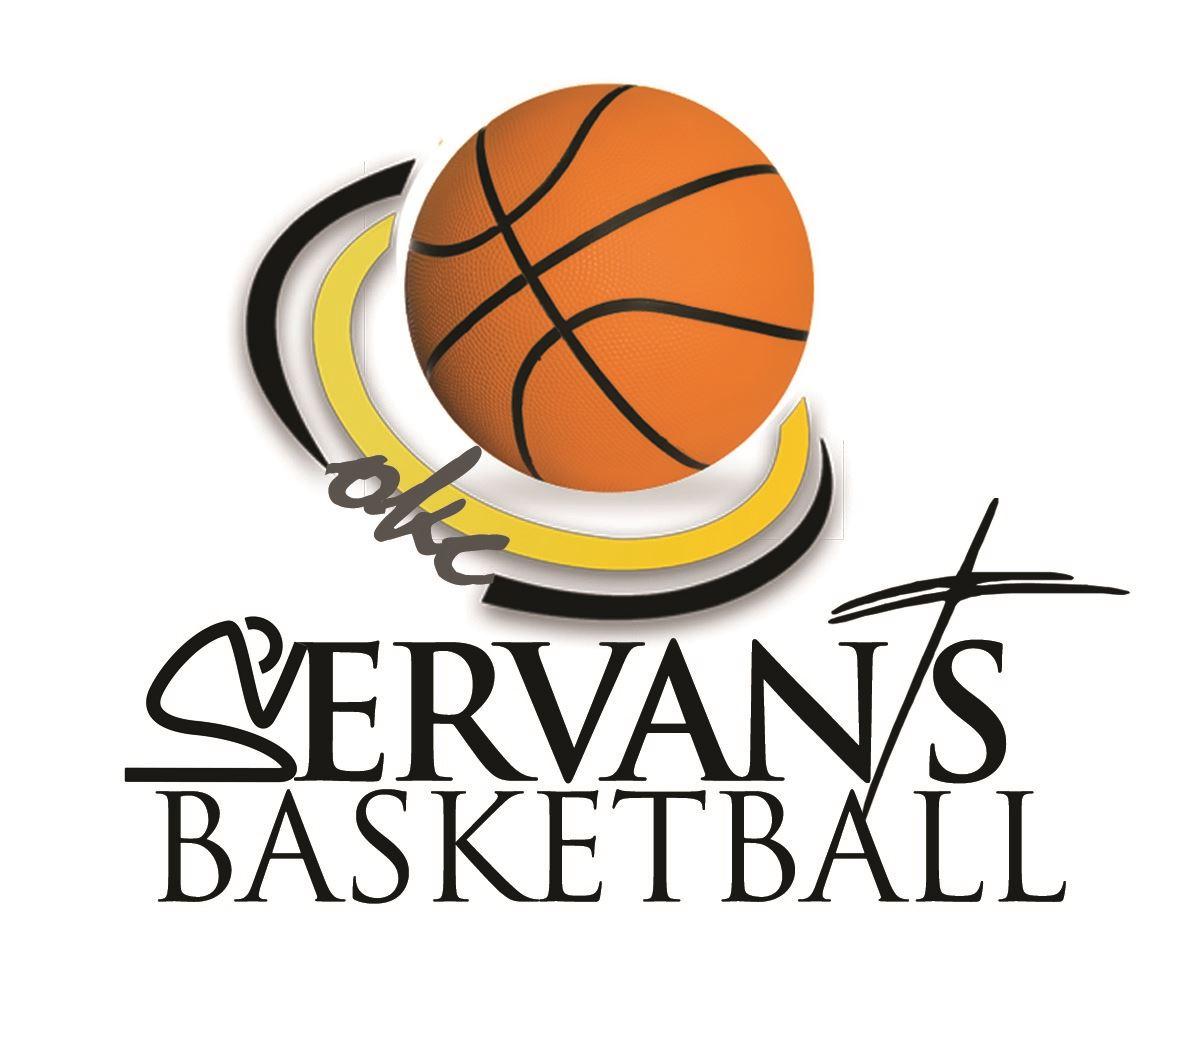 Servants Basketball - Testing